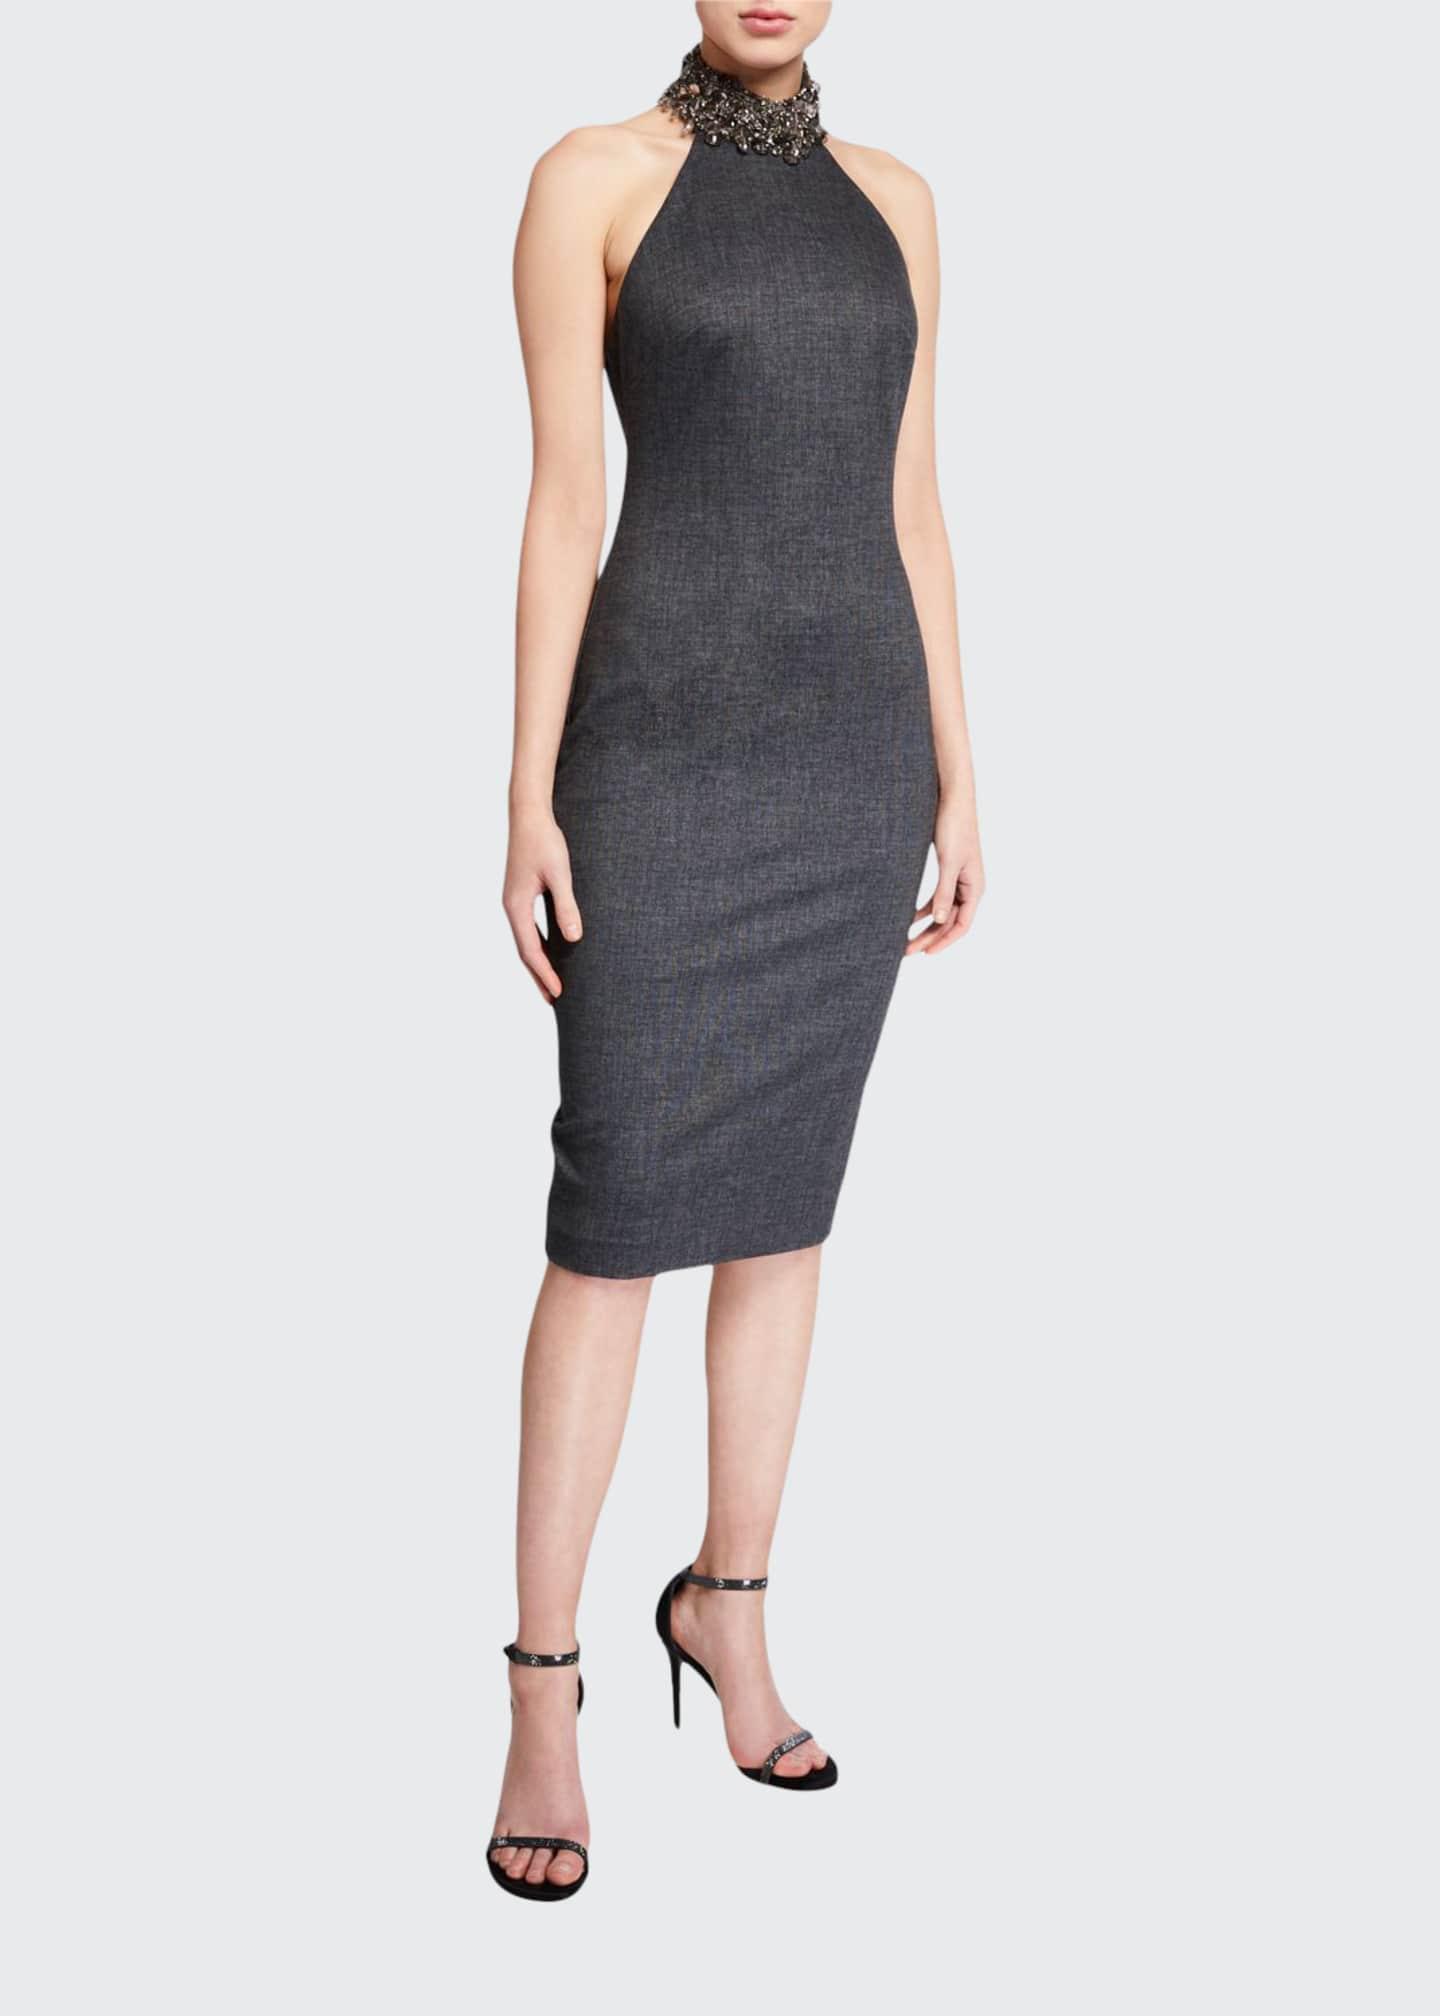 Badgley Mischka Collection Menswear Jeweled Halter Dress